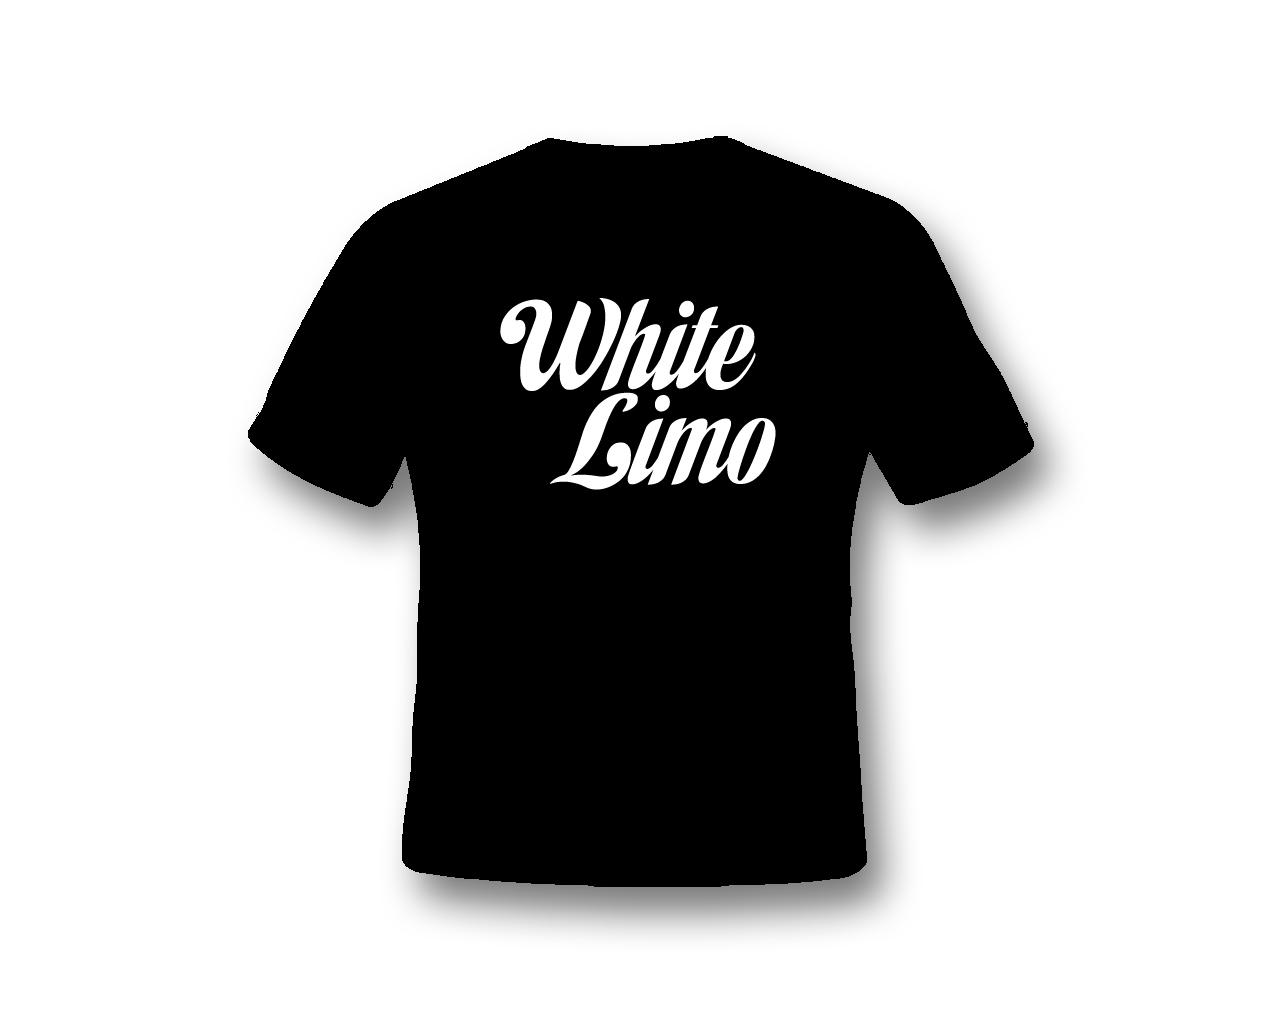 blank-black-t-shirt